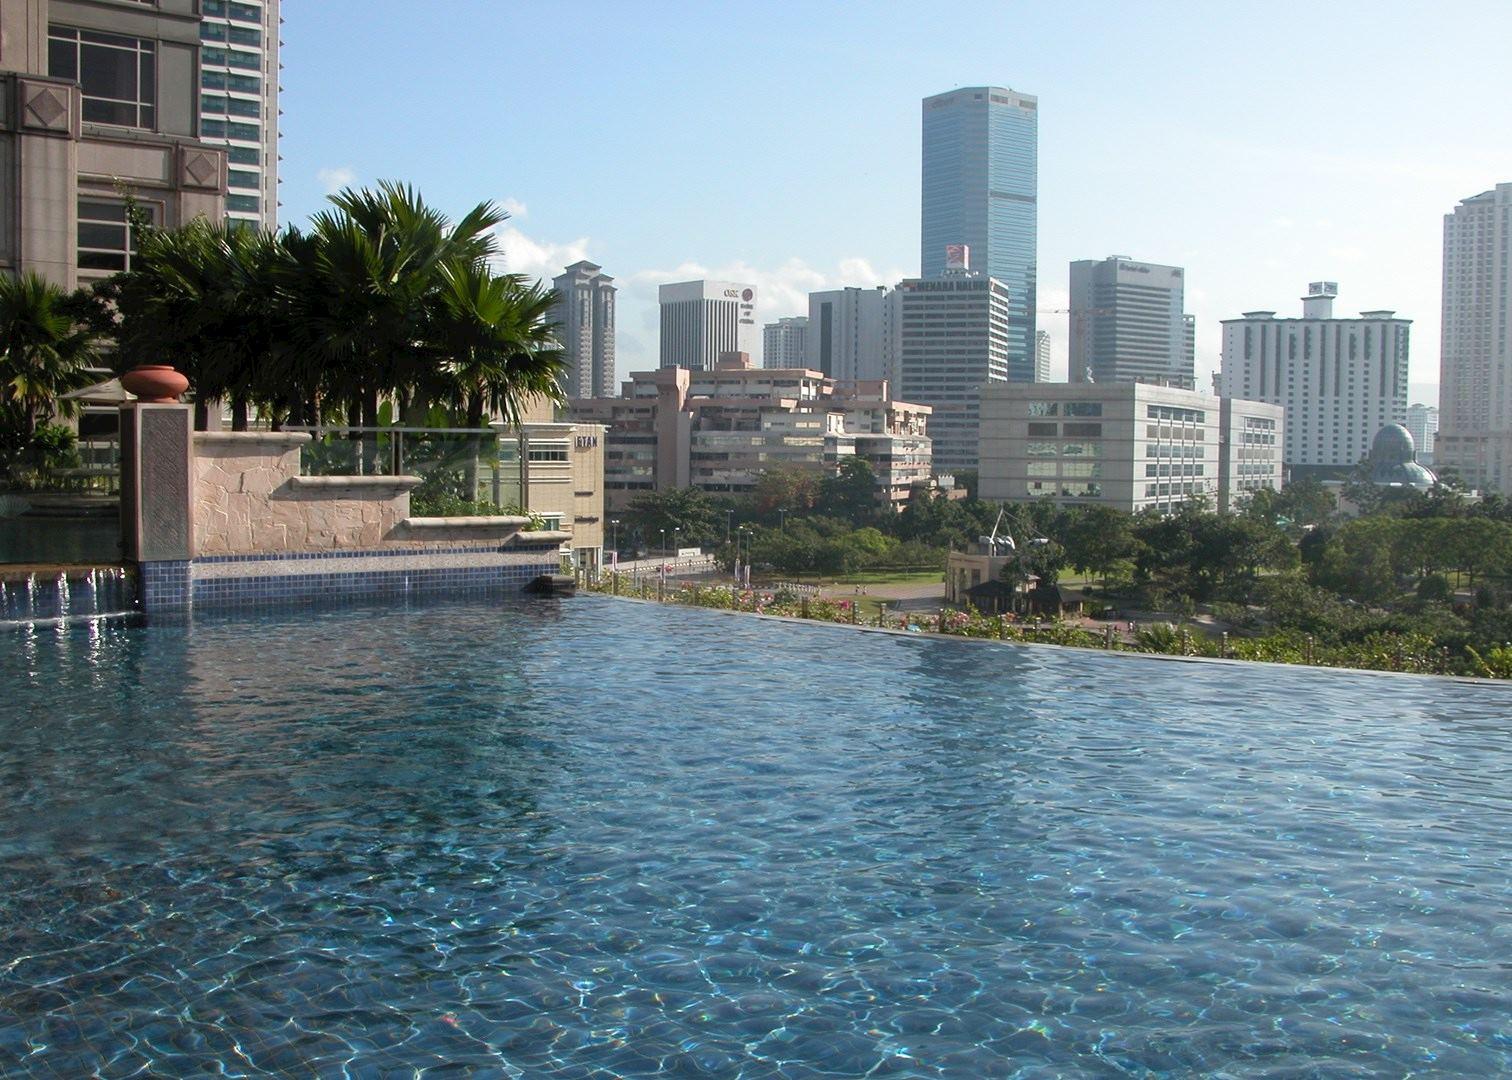 Mandarin oriental hotels in kuala lumpur audley travel - Rooftop swimming pool kuala lumpur ...